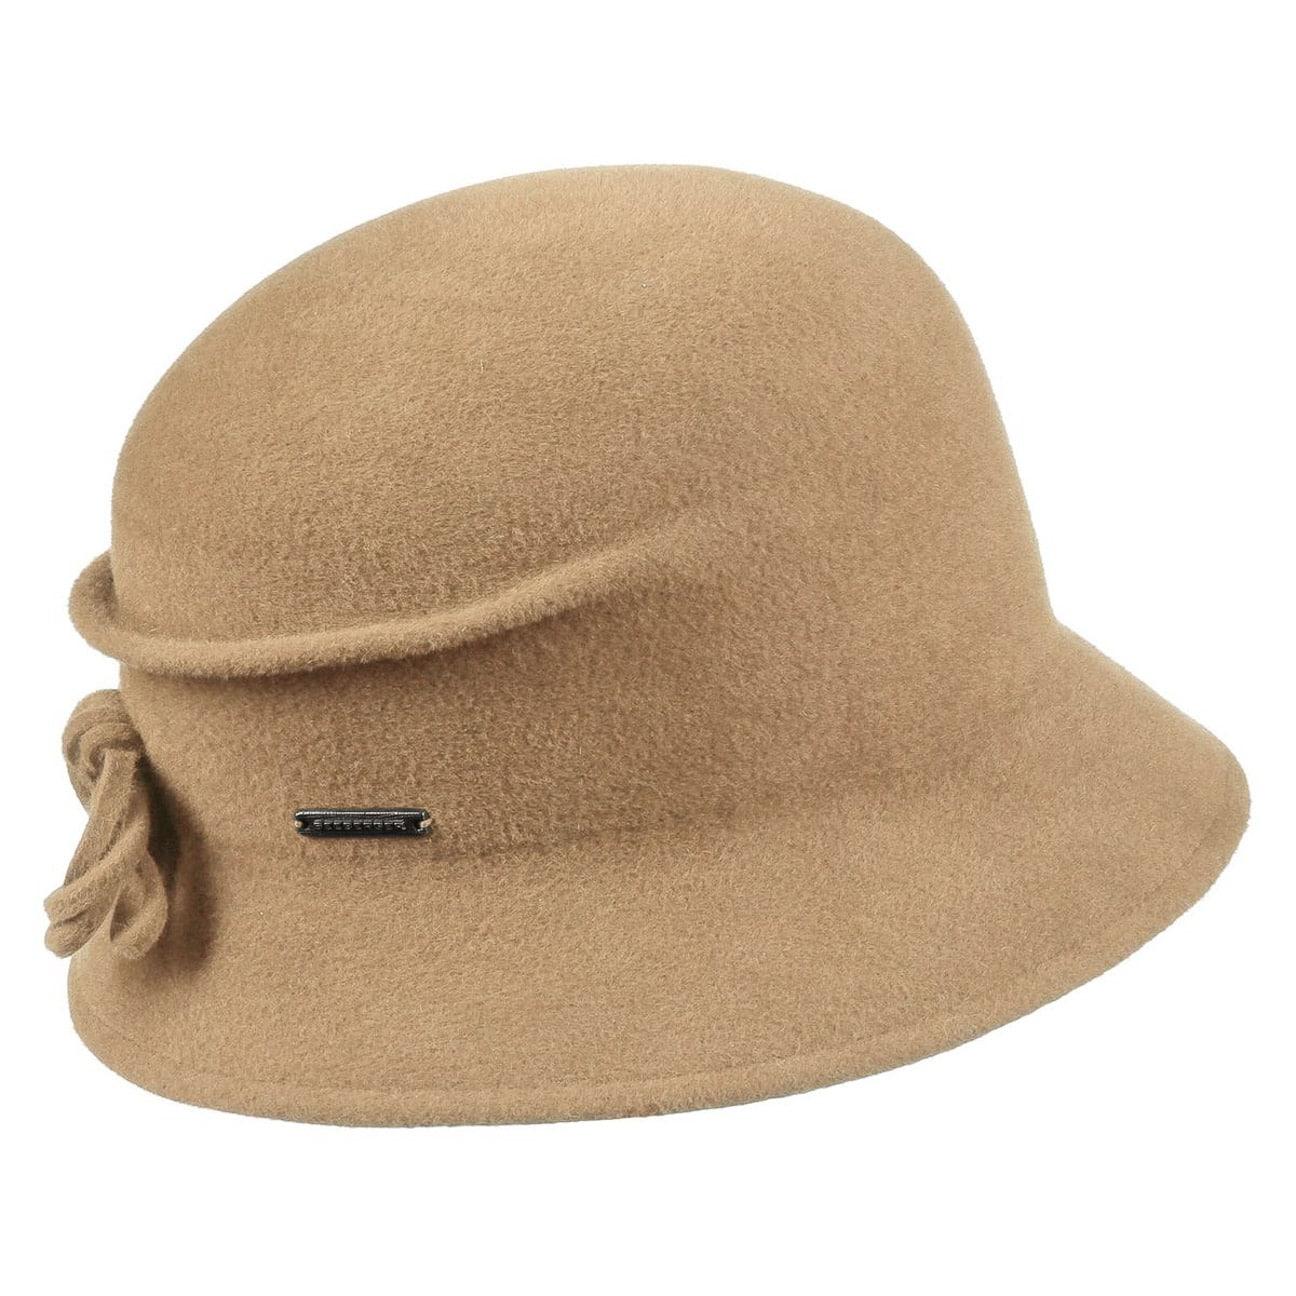 bdf70da7dae ... Sabrina Velours Cloche Hat by Seeberger - camel 1